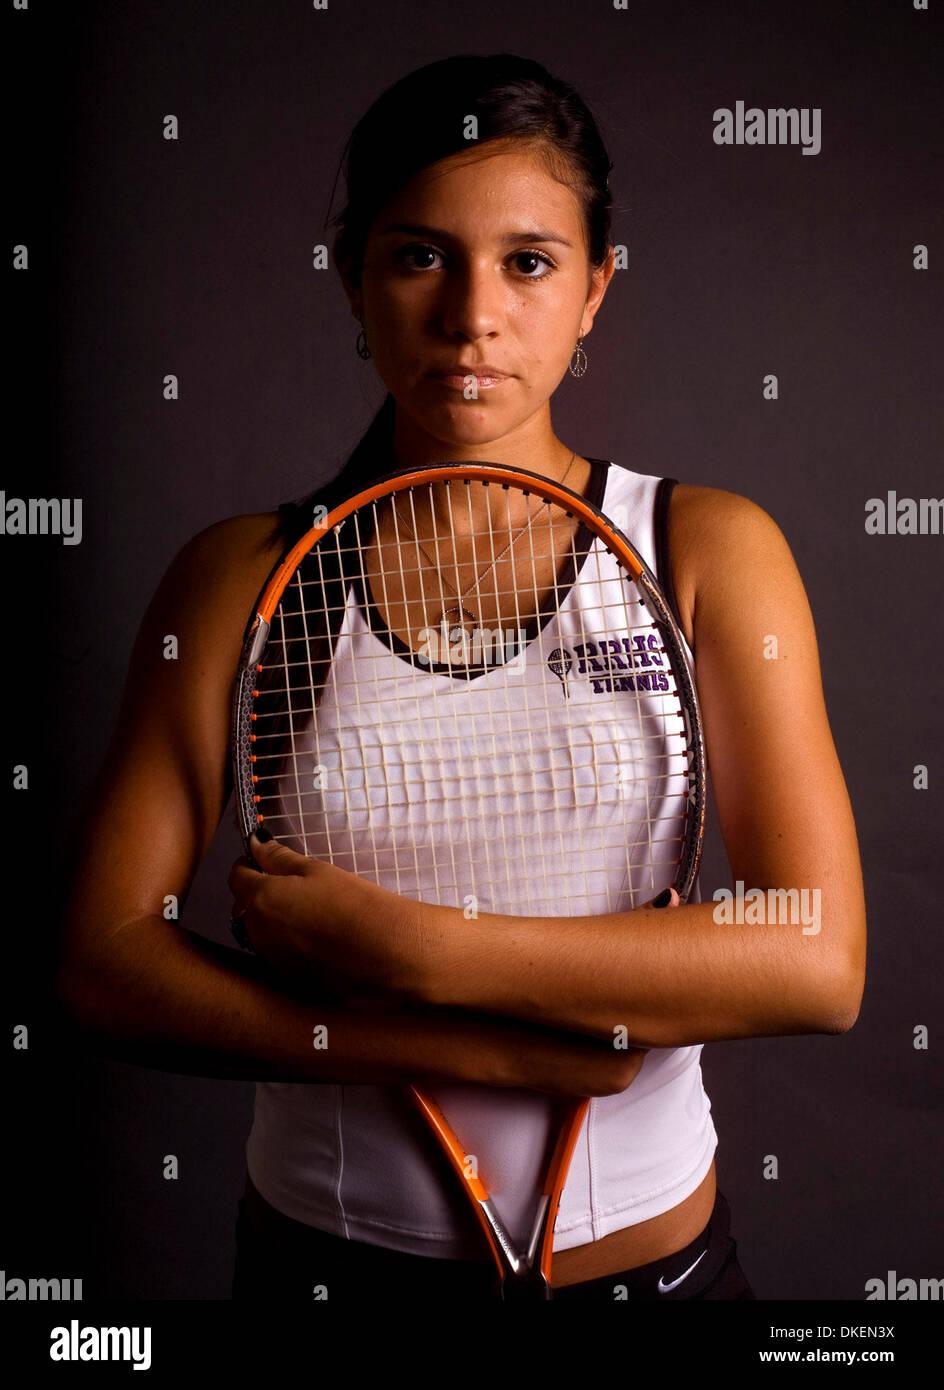 PT_306447_WIGI_allnorth_5 (05/28/2009 Wesley Chapel) River Ridge's Nicola Wellman, 17, is this year's North Suncoast girls tennis player of the year. (Credit Image: © St. Petersburg Times/ZUMA Press) - Stock Image